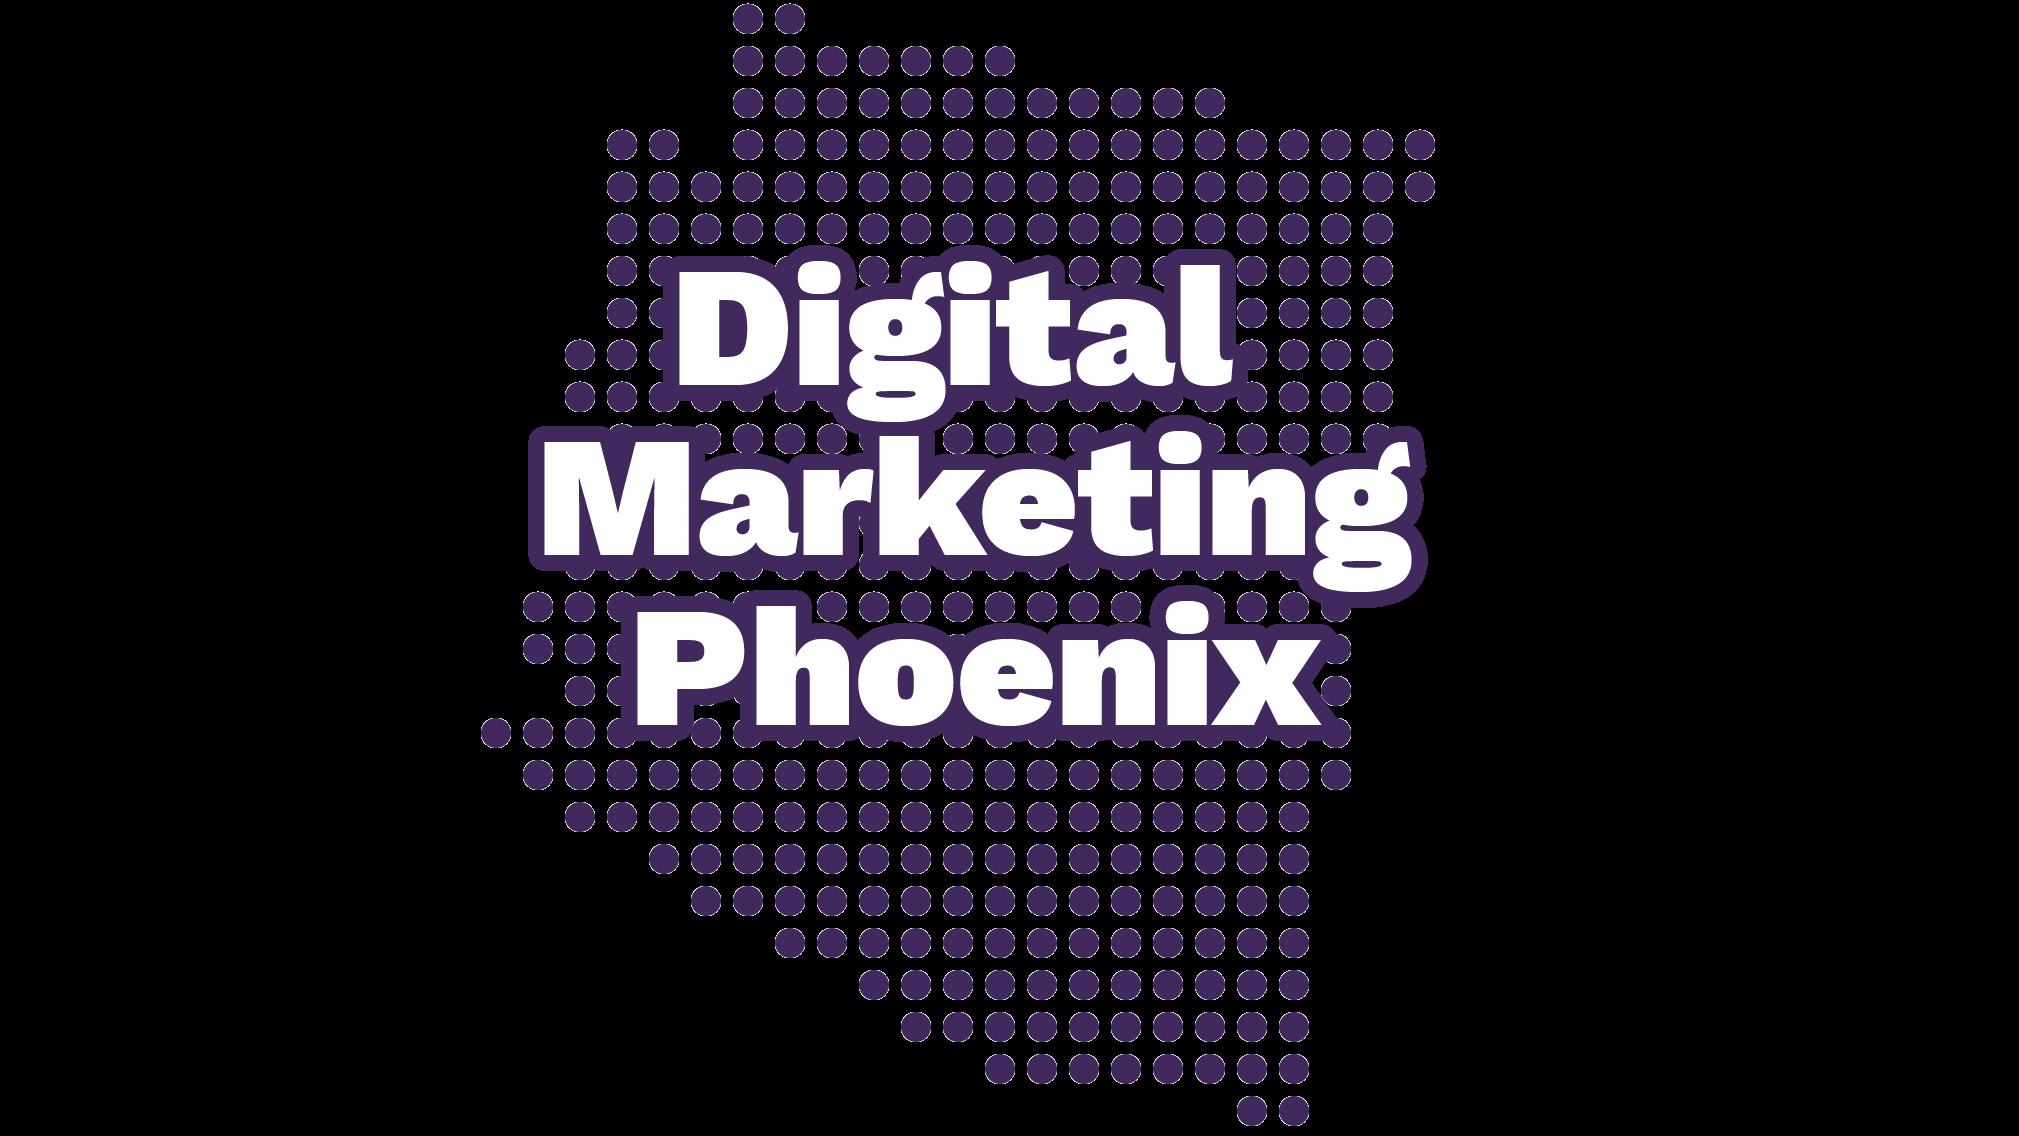 Digital Marketing Meetup - Phoenix